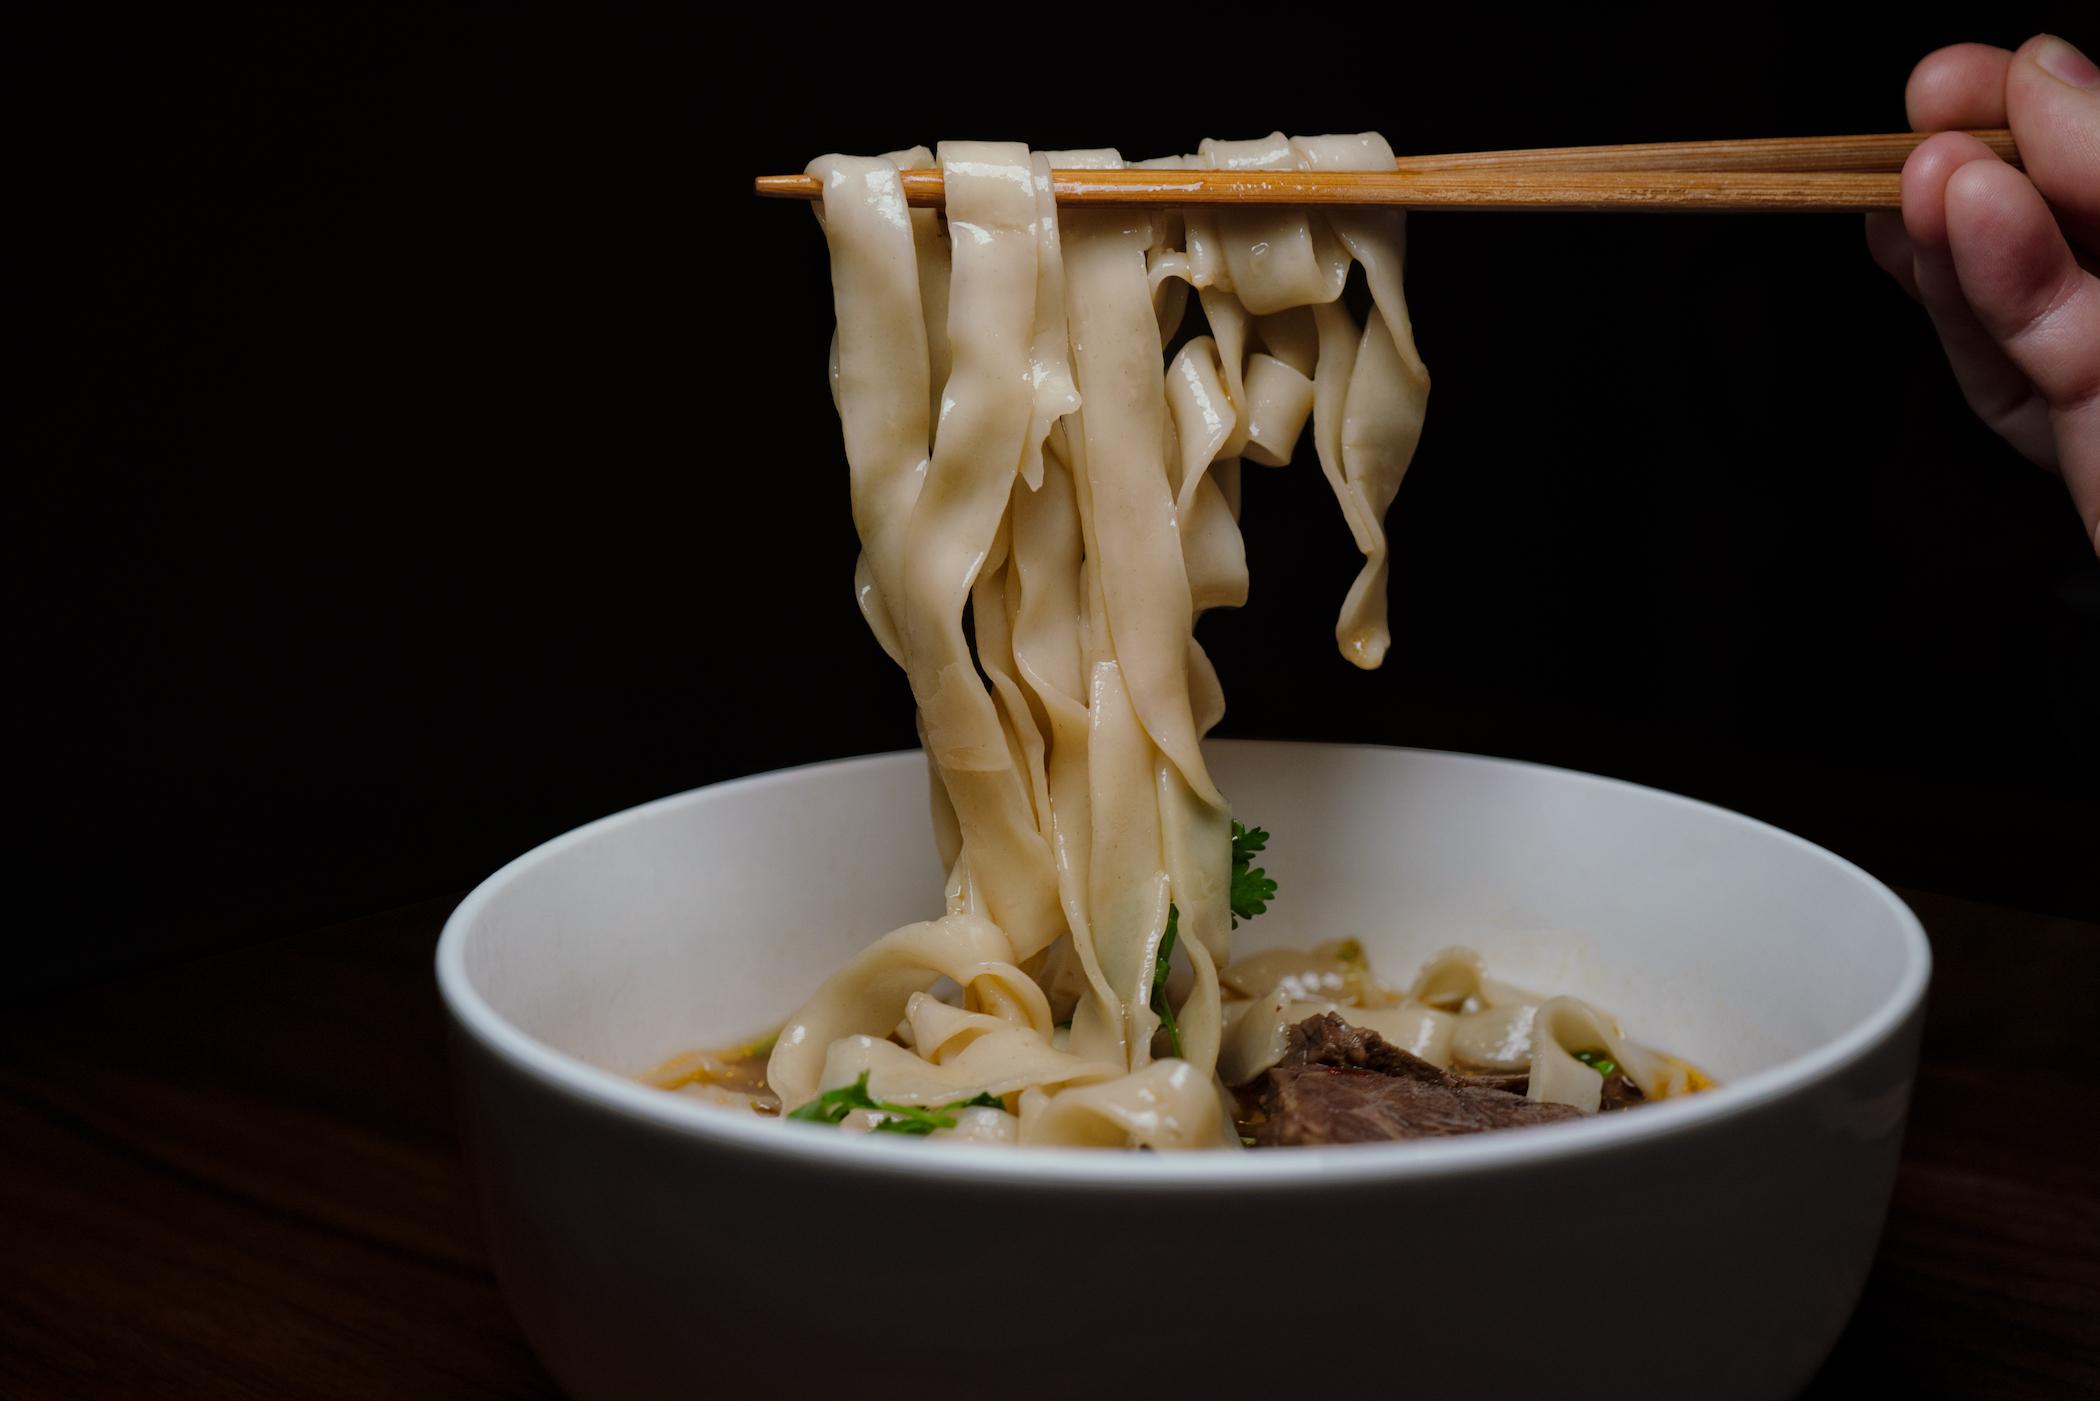 Ho Foods beef noodle soup - wide noodles